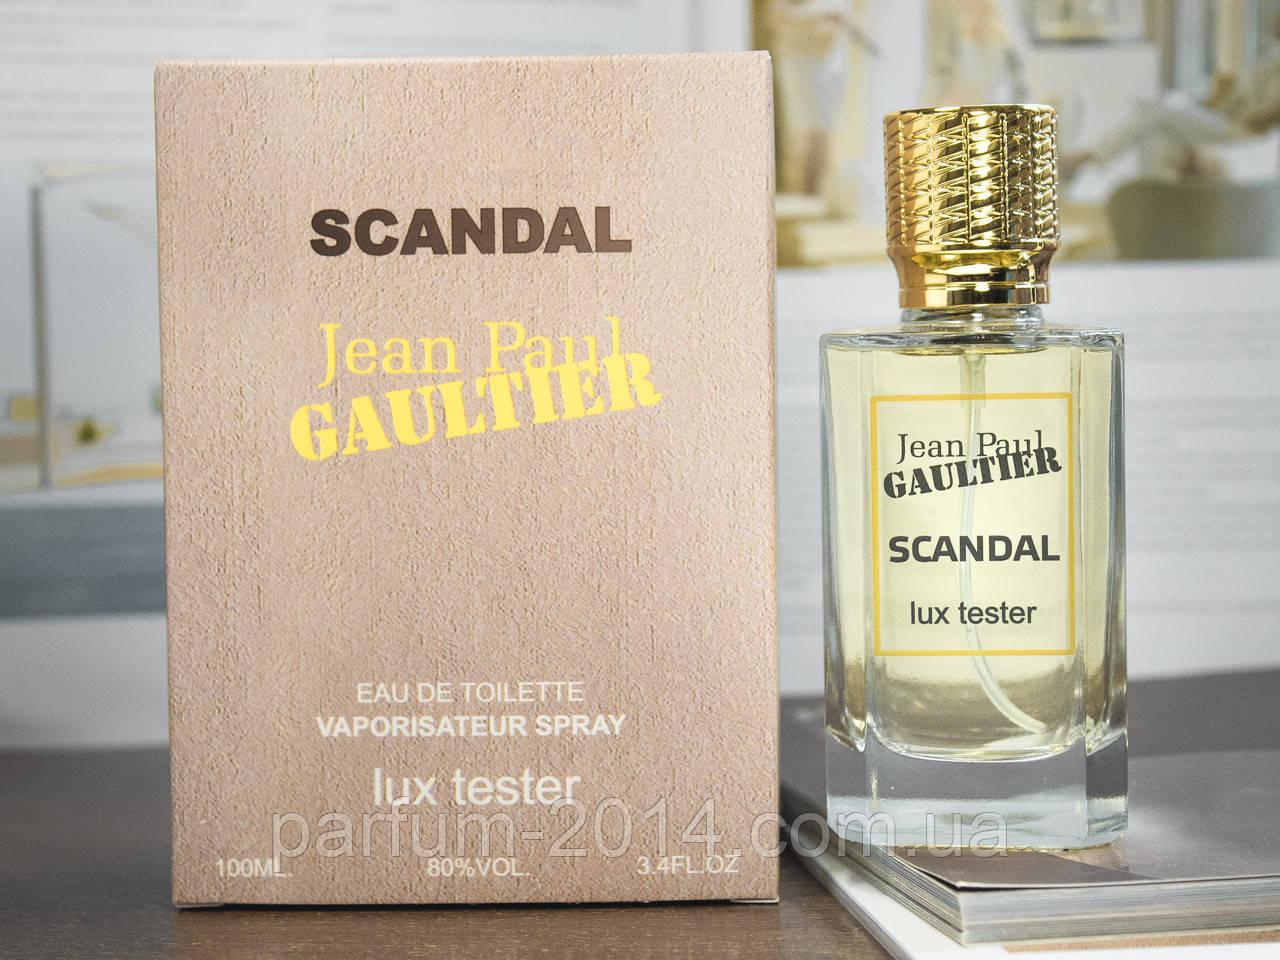 Жіночий аромат жан поль готьє скандал Jean Paul Gaultier Scandal 100 мл (осіб) парфуми парфуми пробник тестер